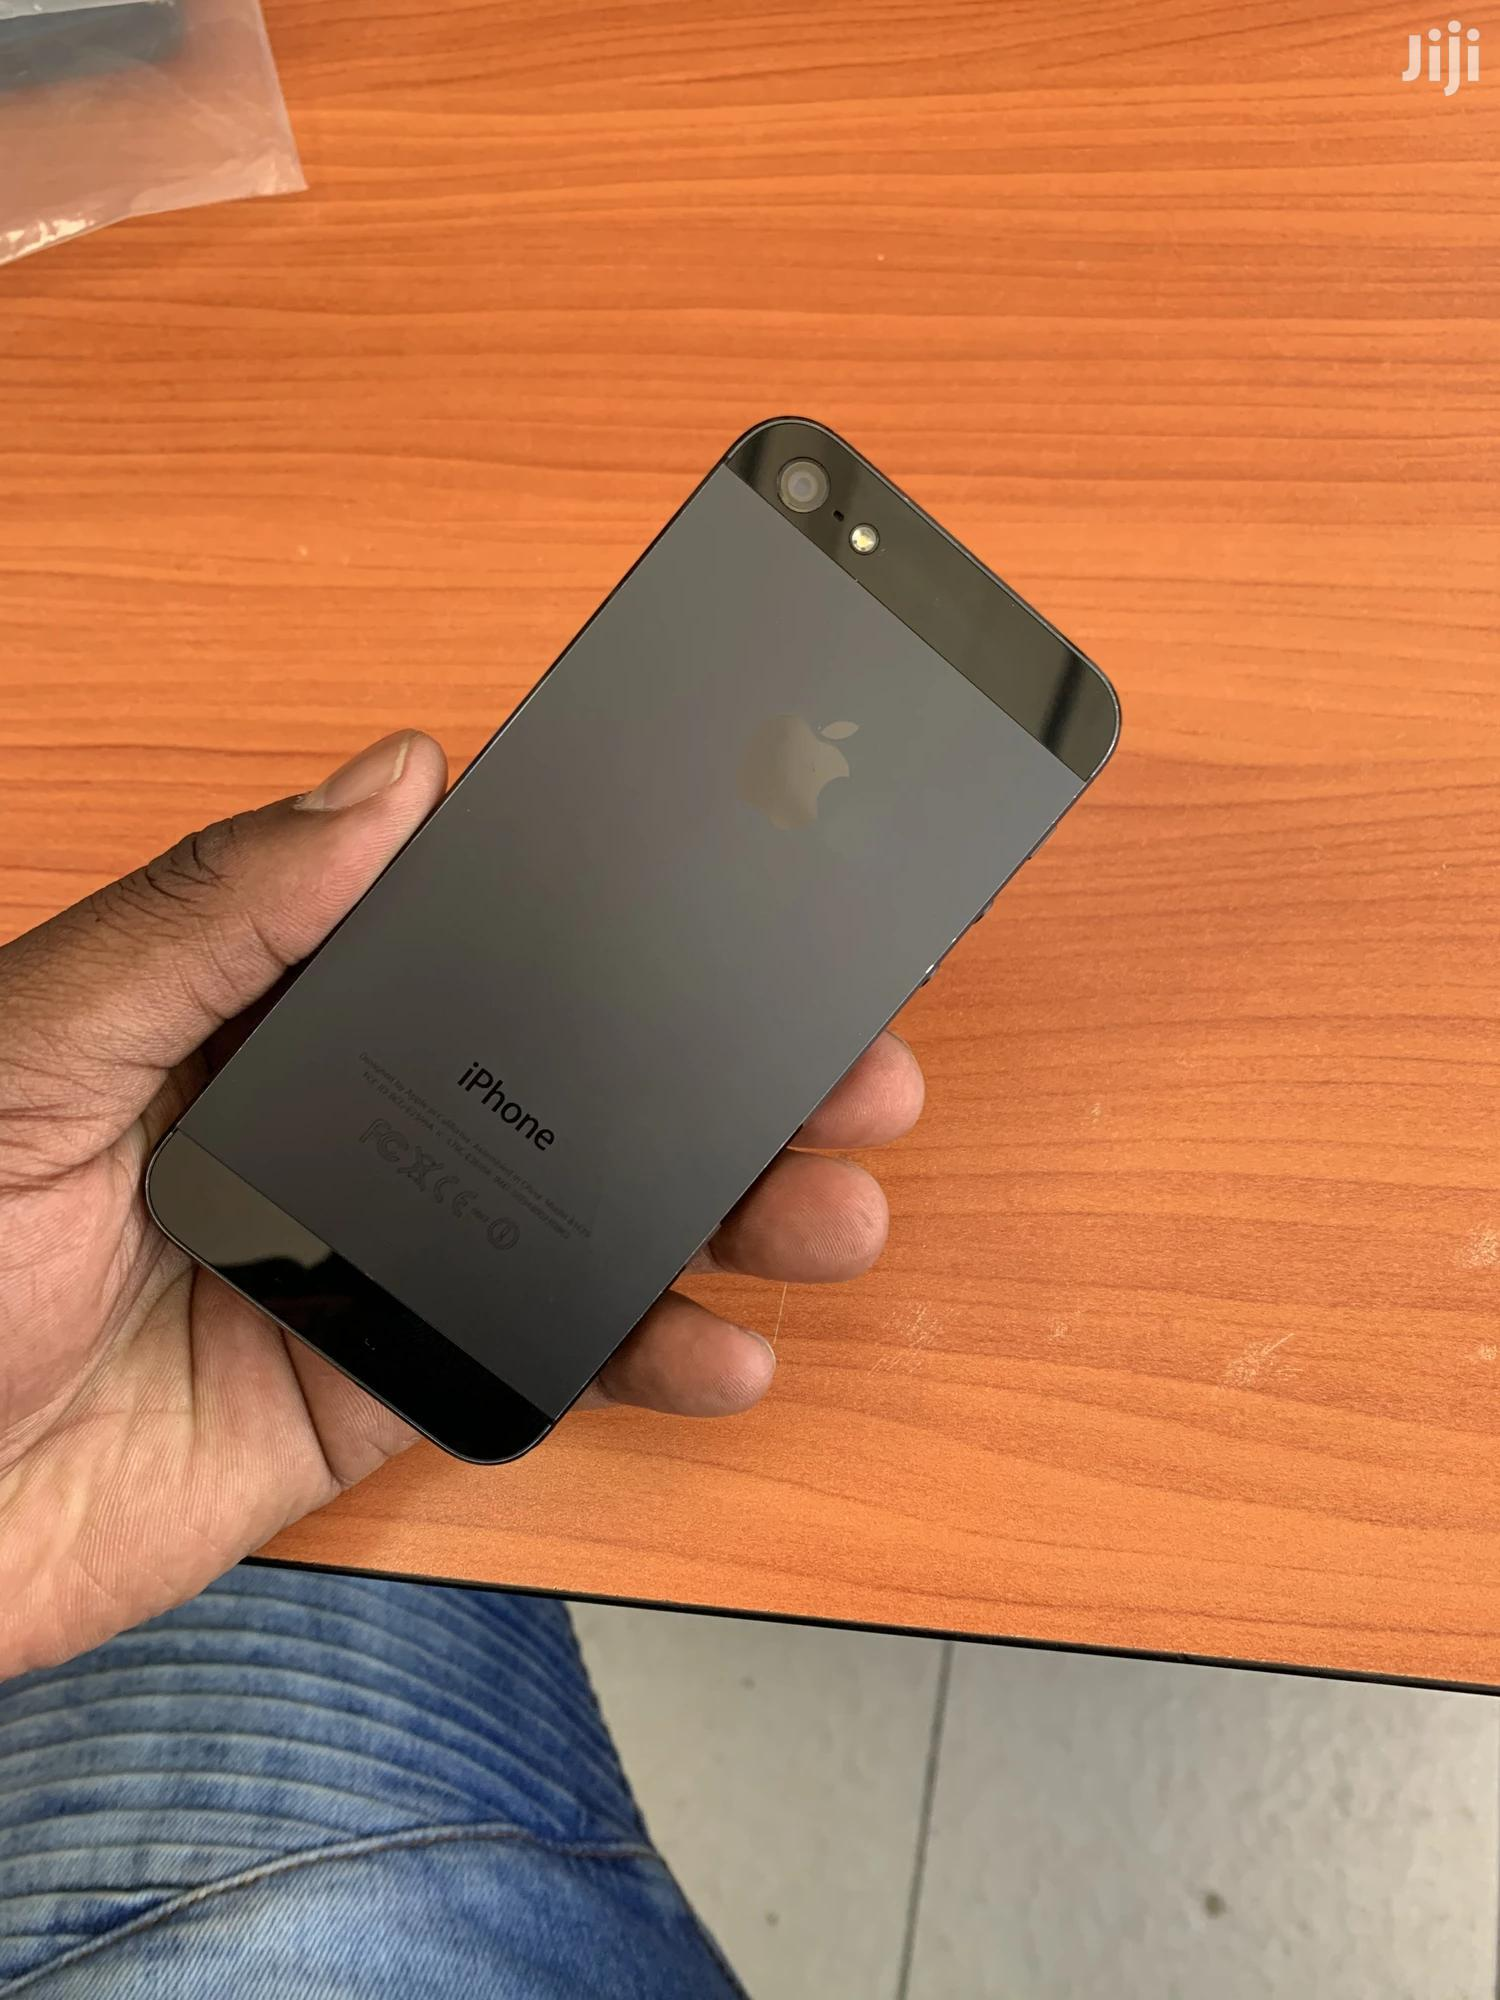 Apple iPhone 5 32 GB Gray